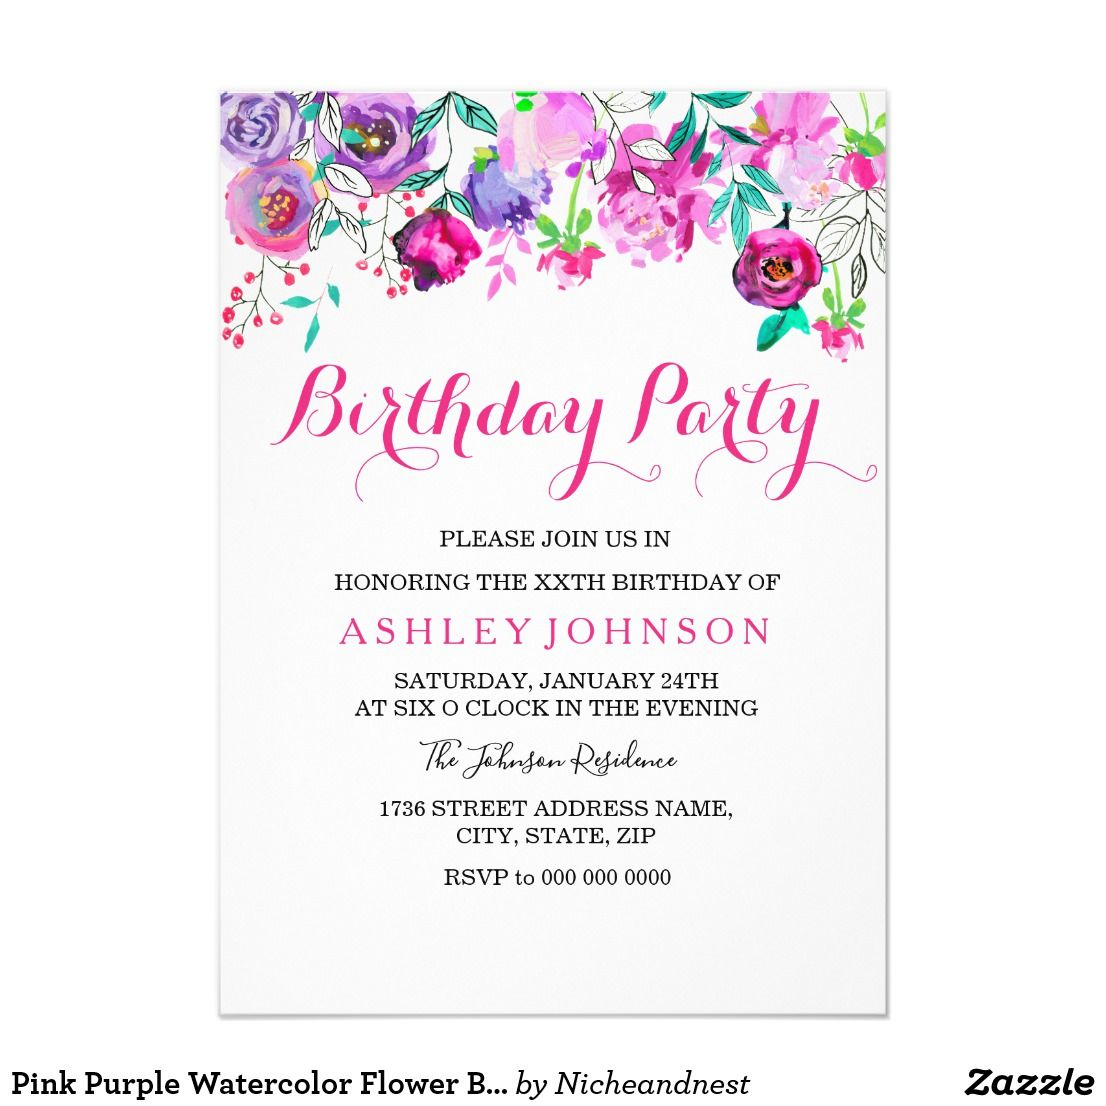 Pink Purple Watercolor Flower Birthday Party Invitation | birthday ...